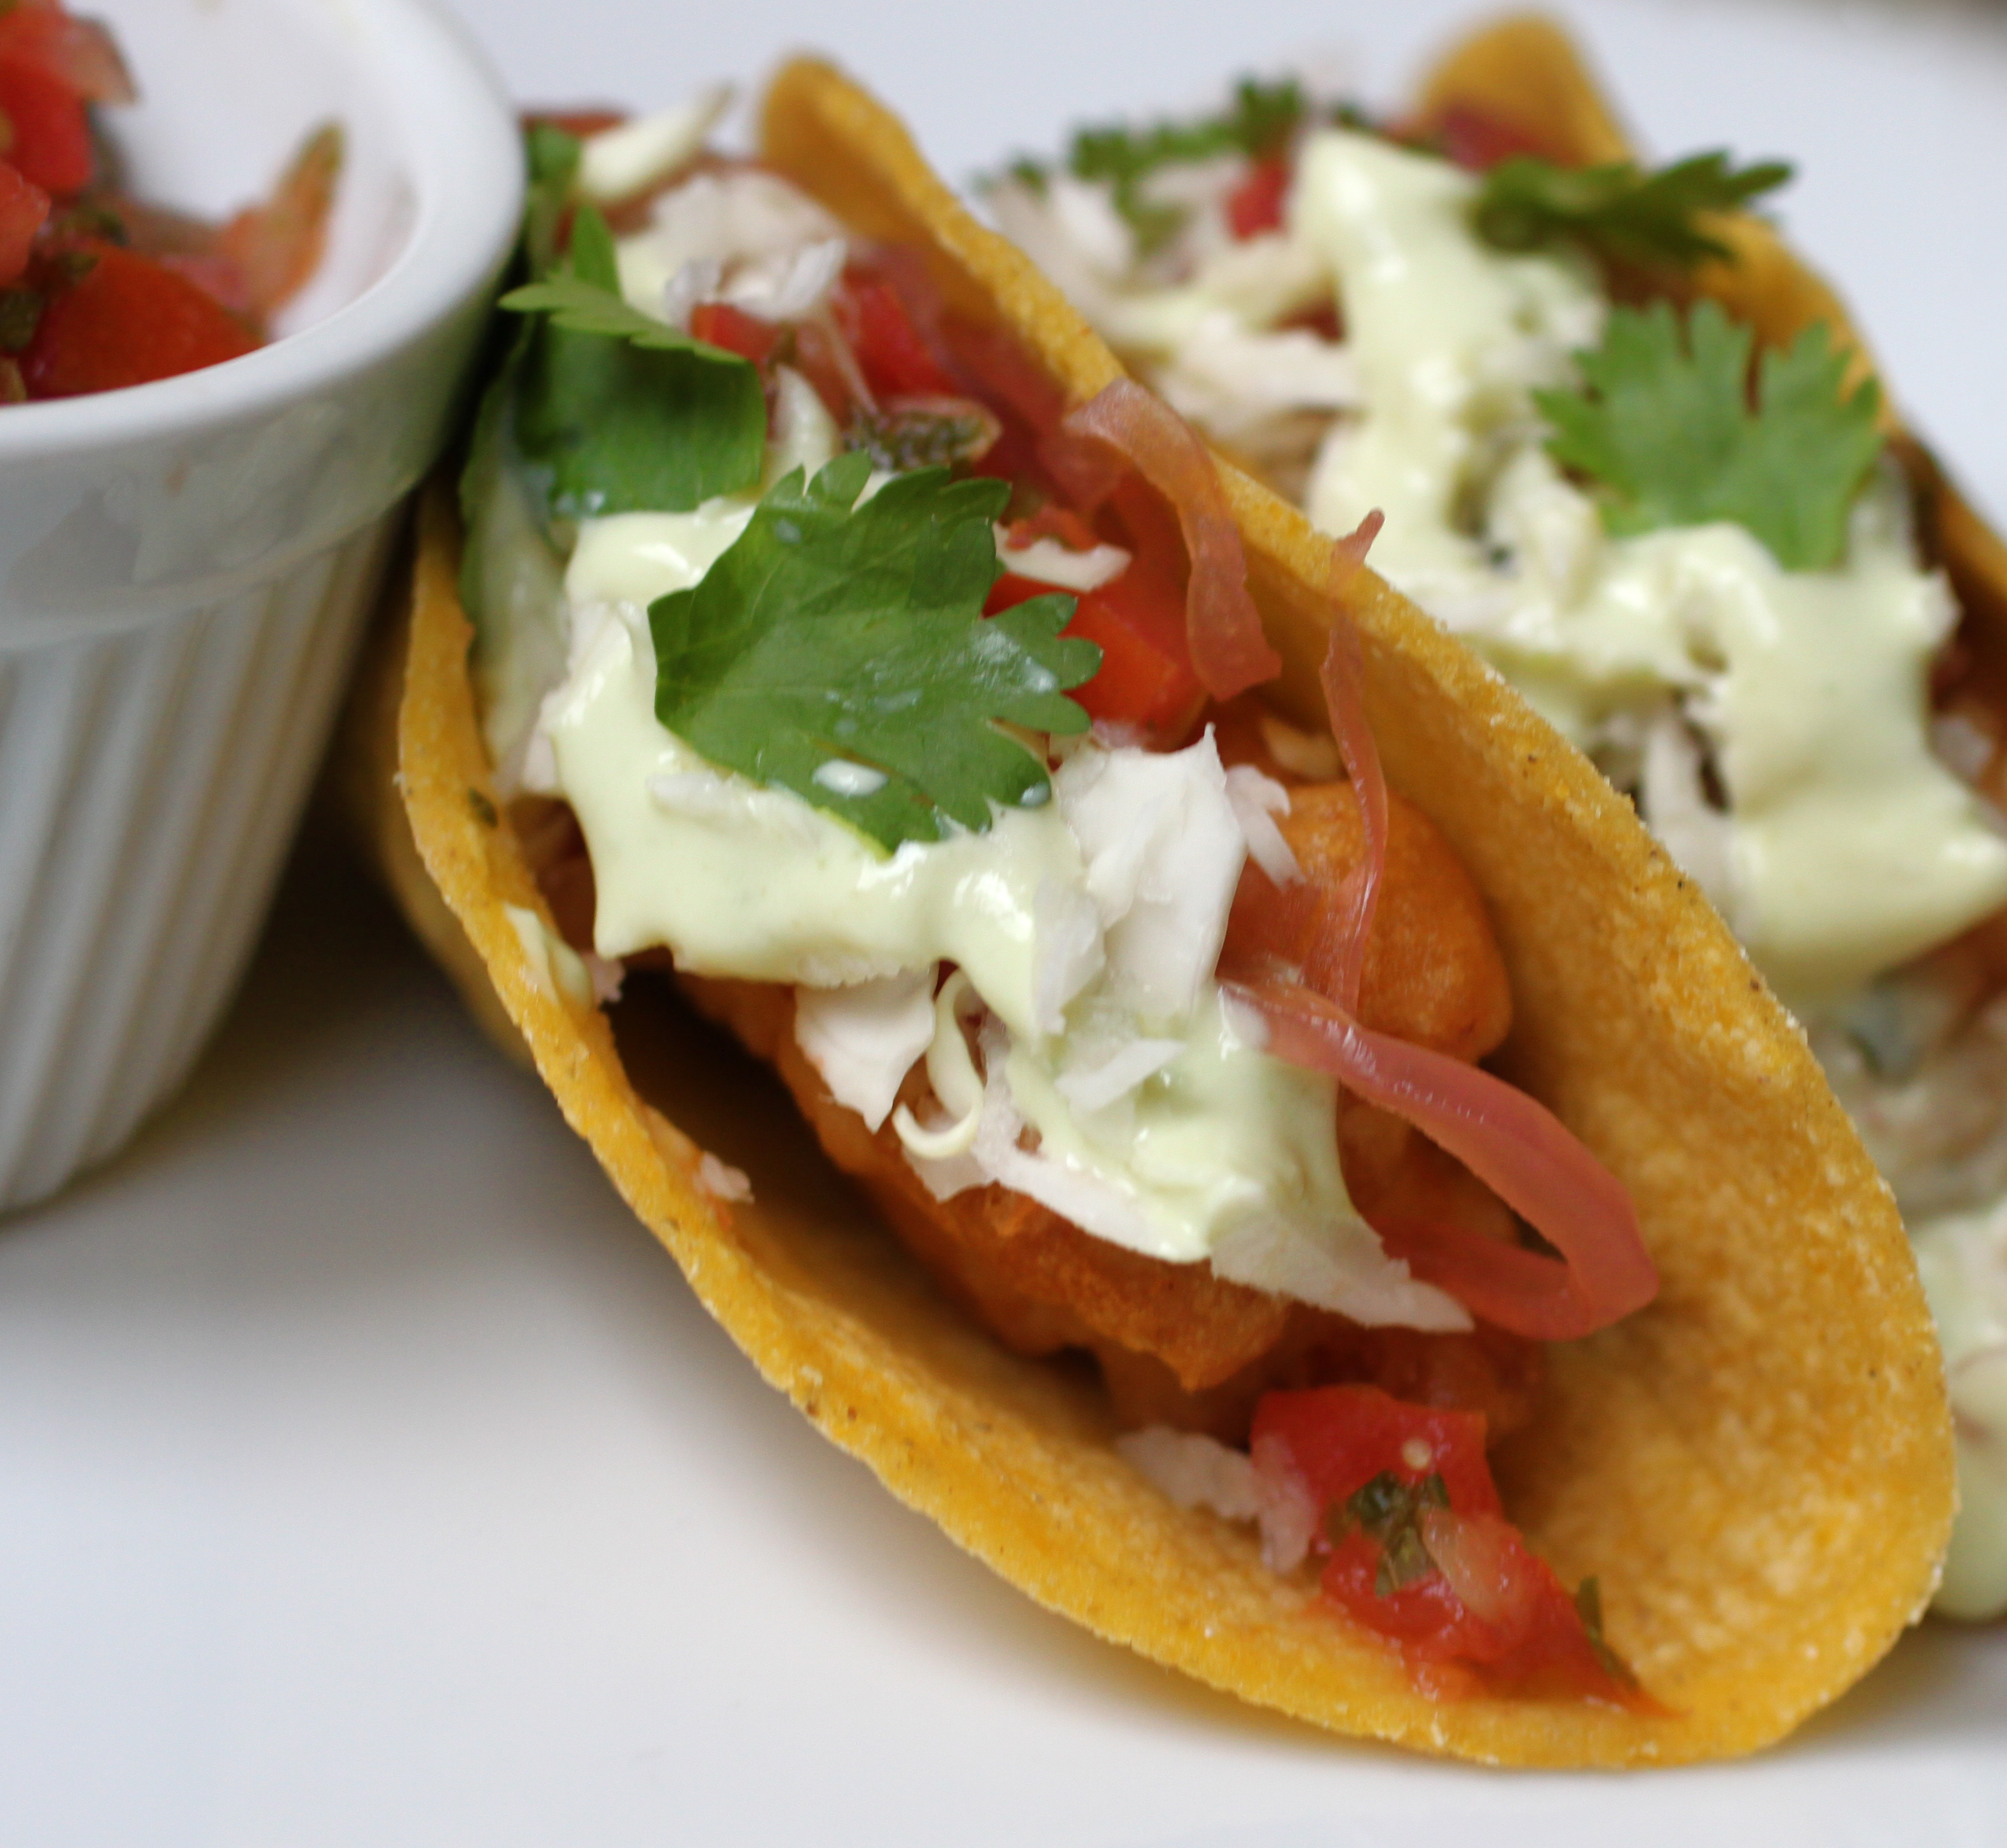 Crispy fish tacos for Breaded fish tacos